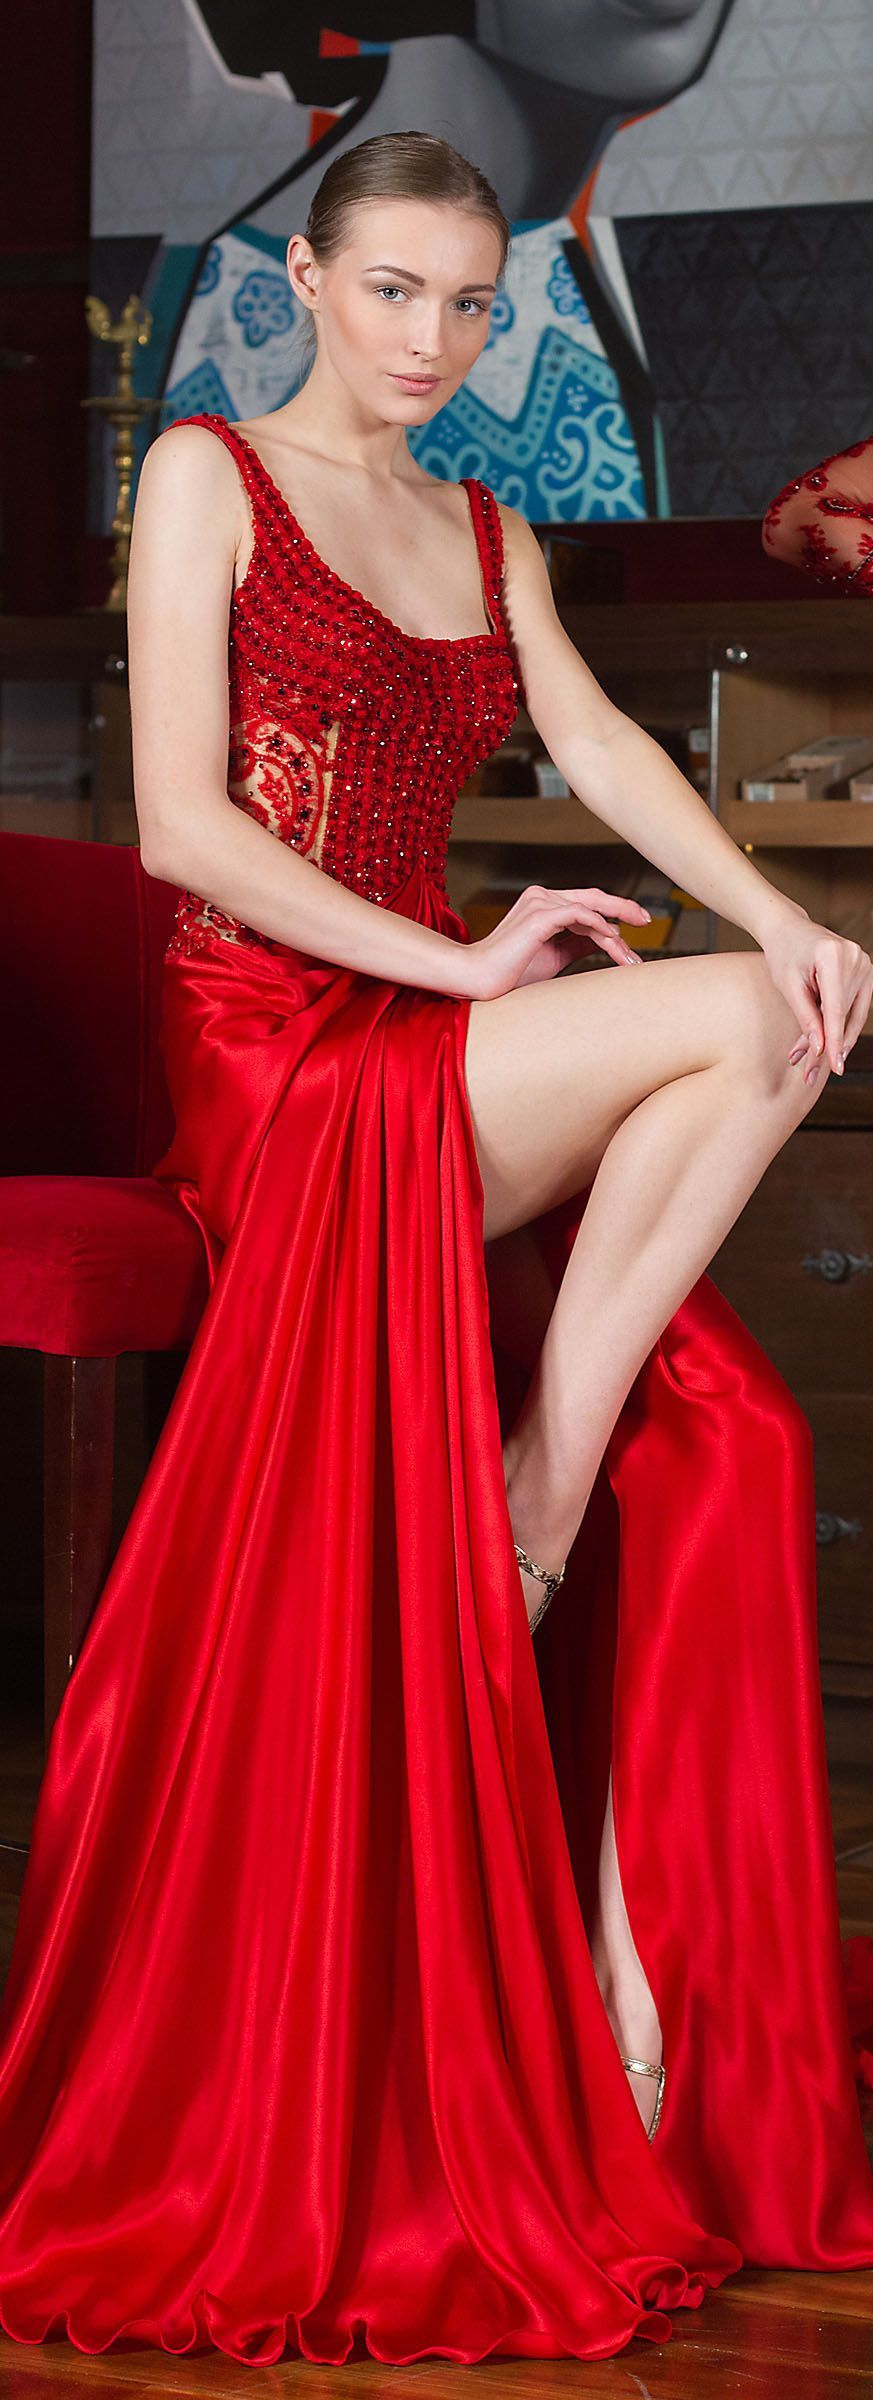 Toufiq hatab red wine u ruby dresses u gown are haute couture